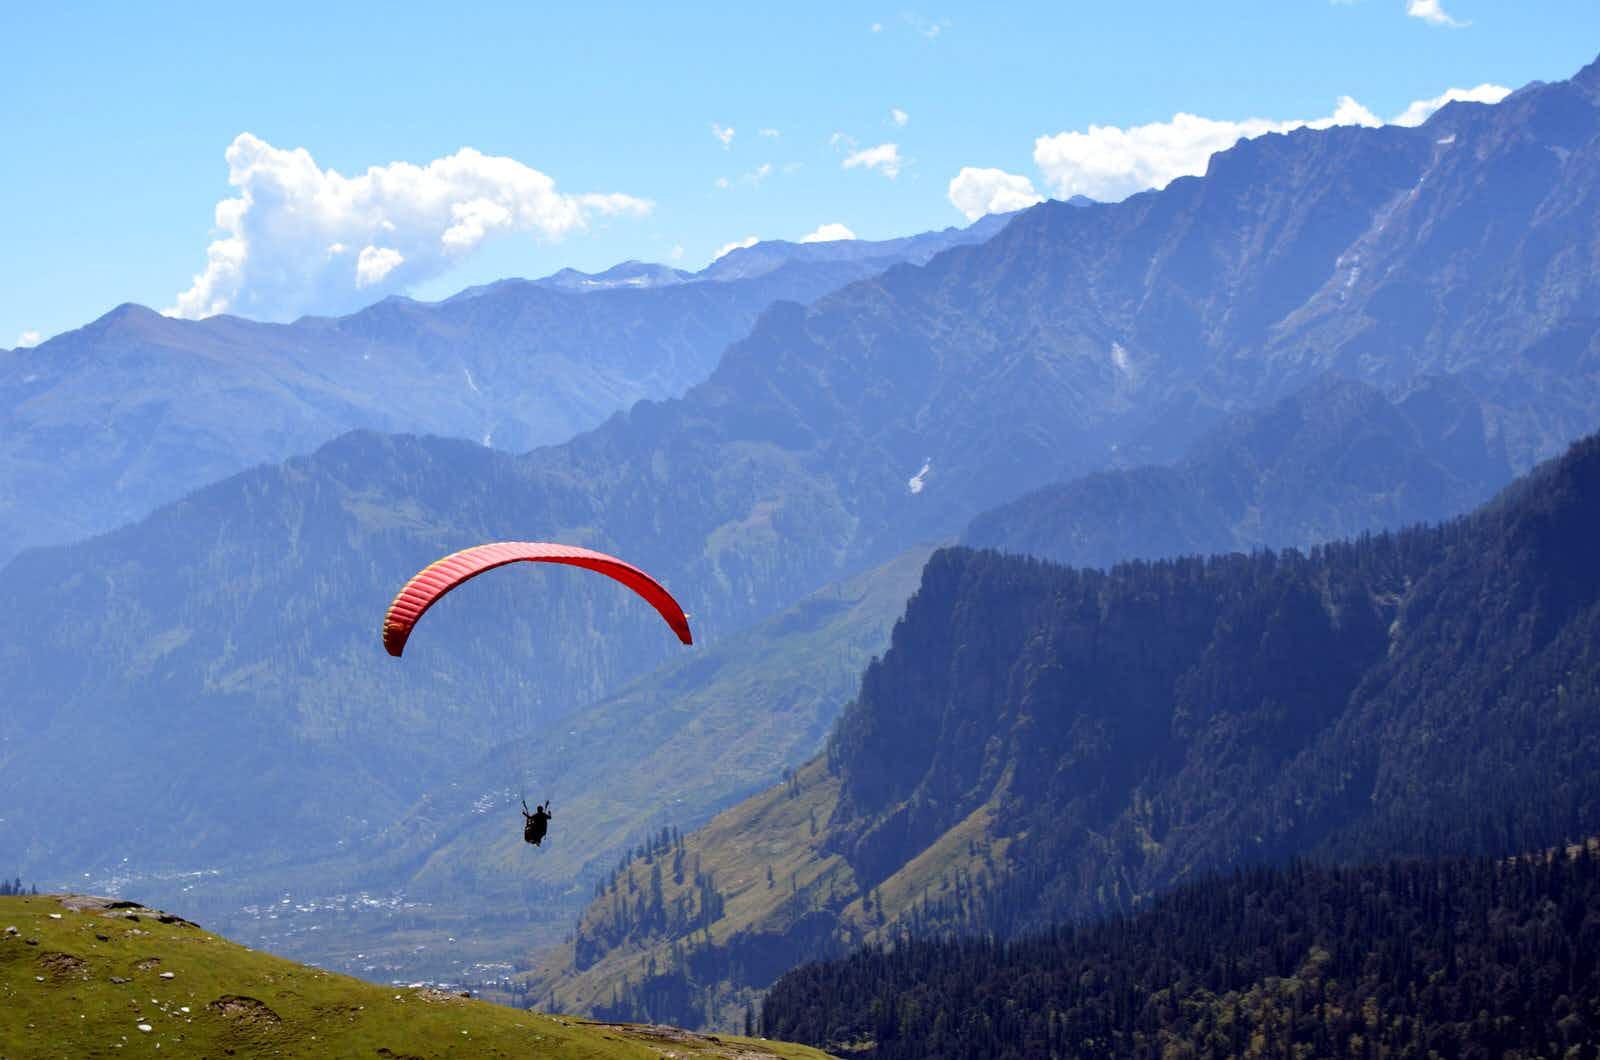 Himachal Pradesh: adventures in India's mountain playground